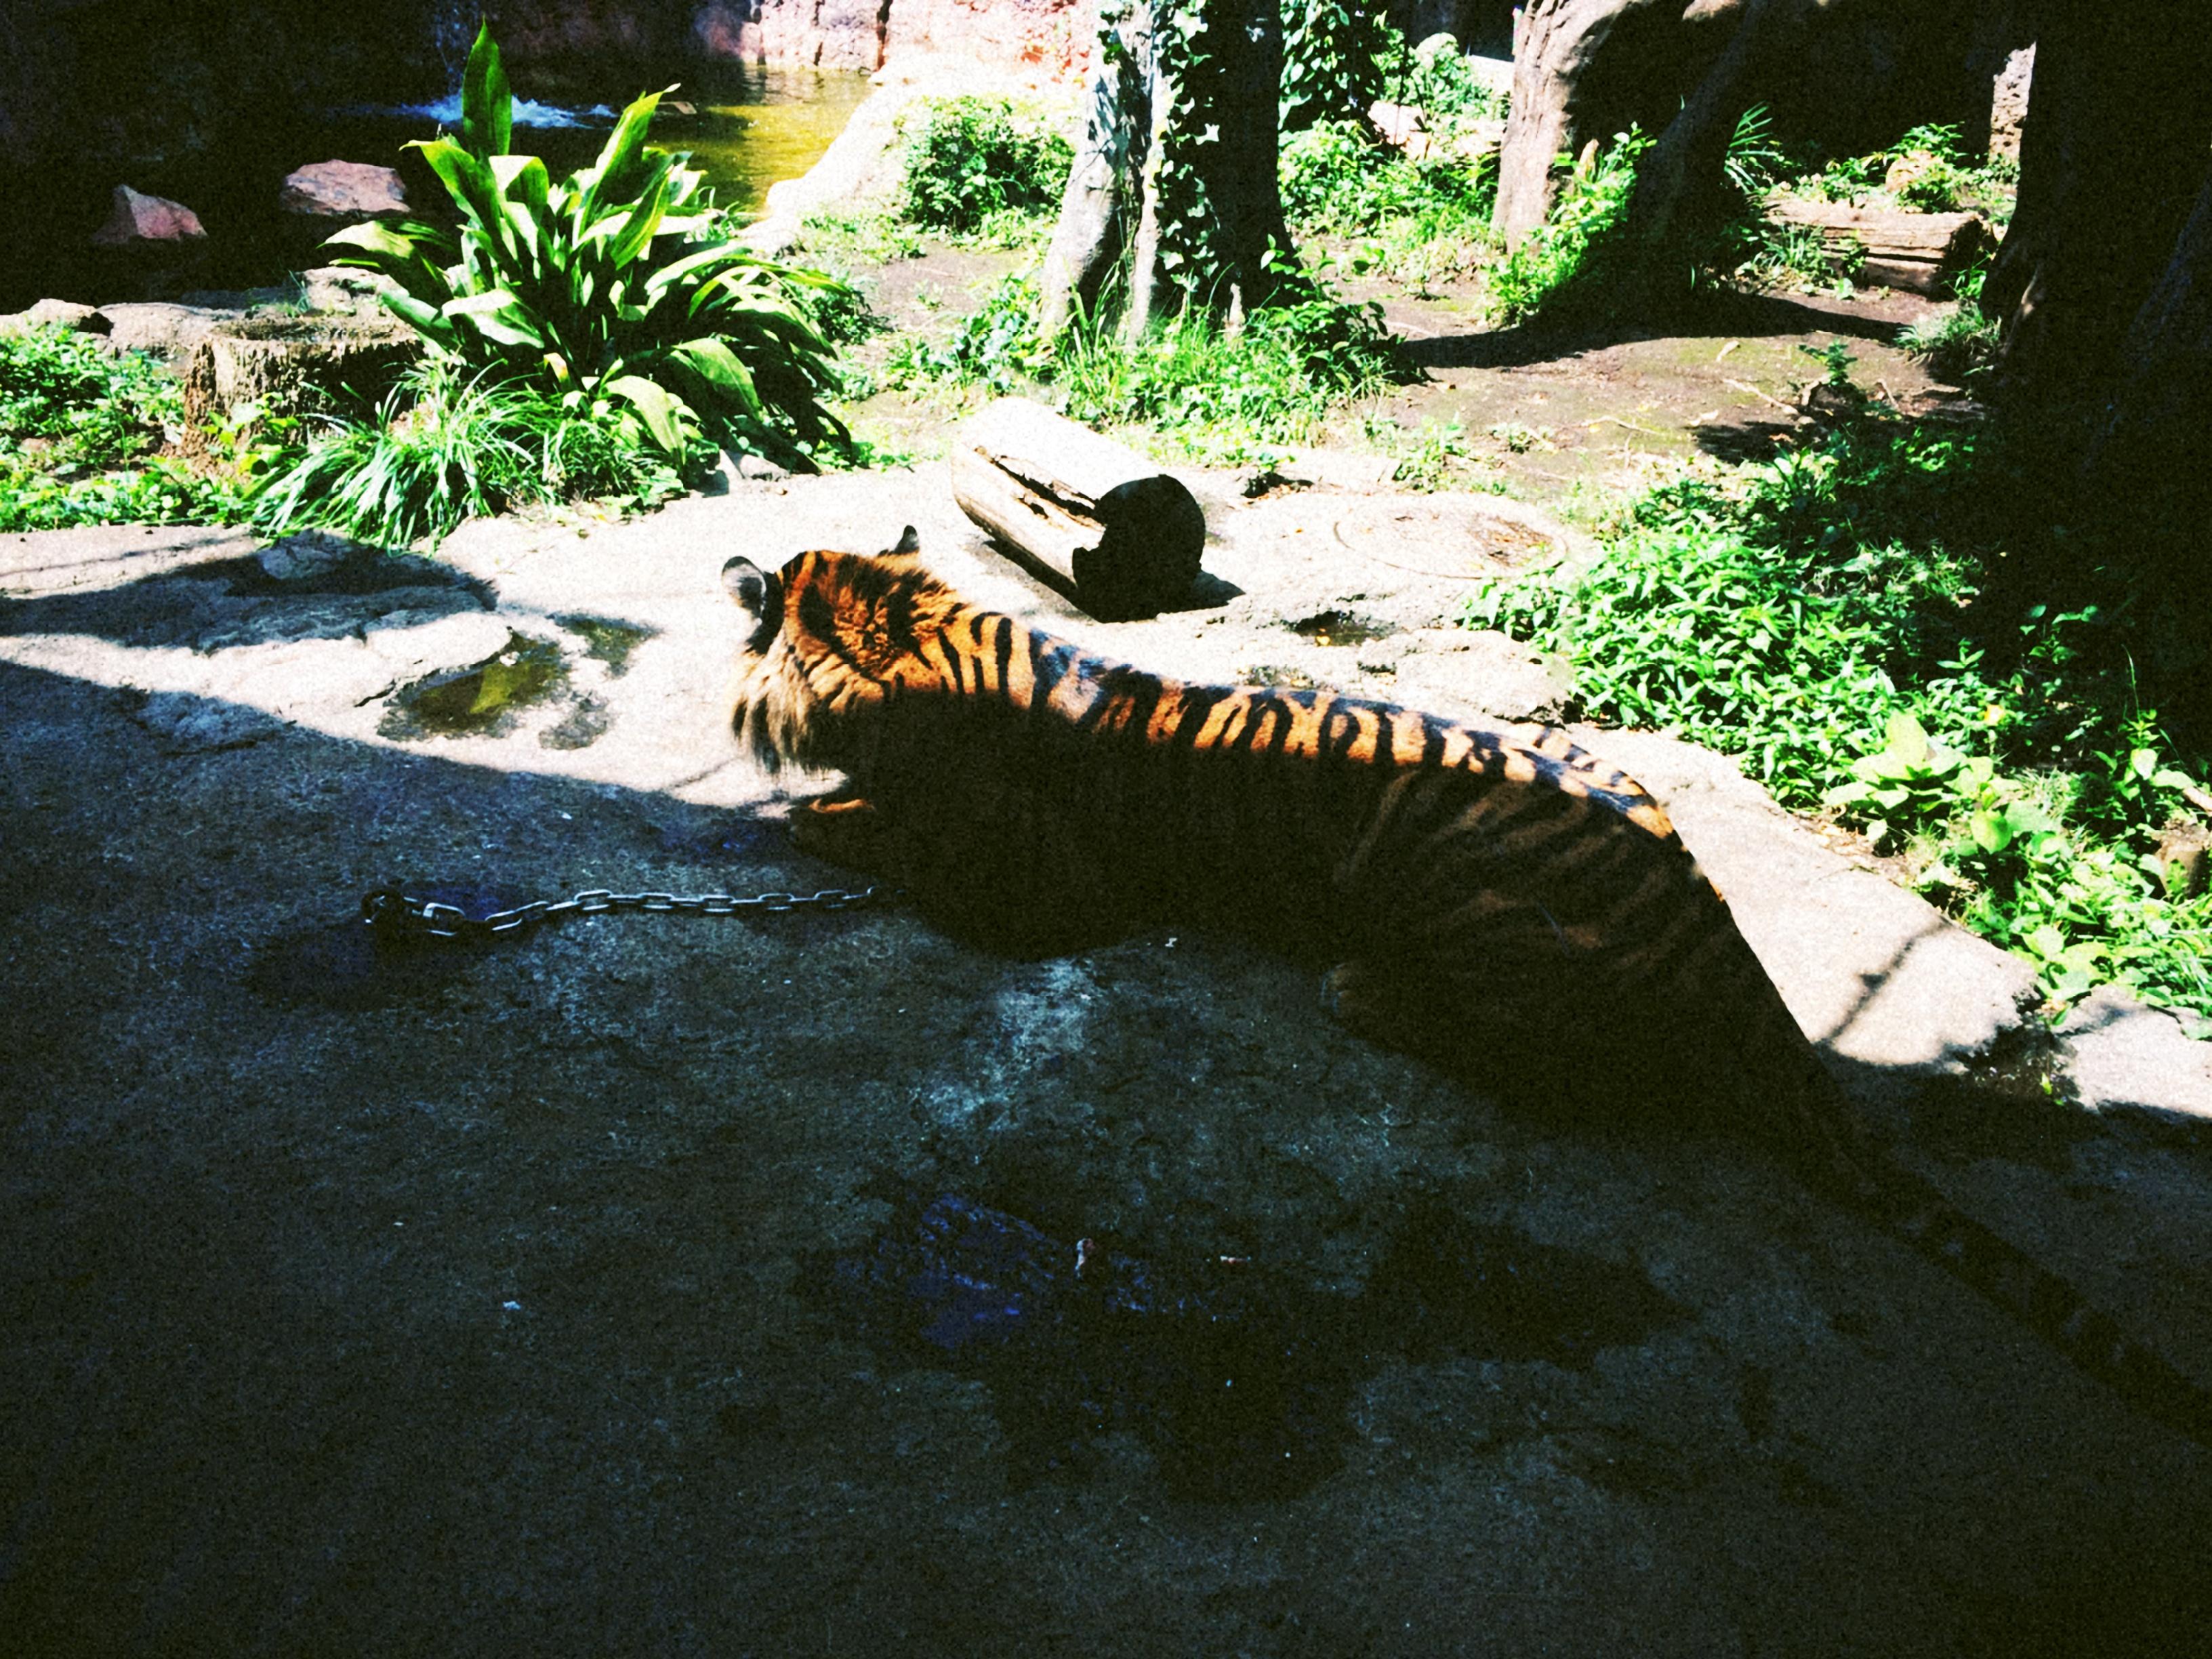 Jepang Kebun Binatang Ueno Saskyongs Blog